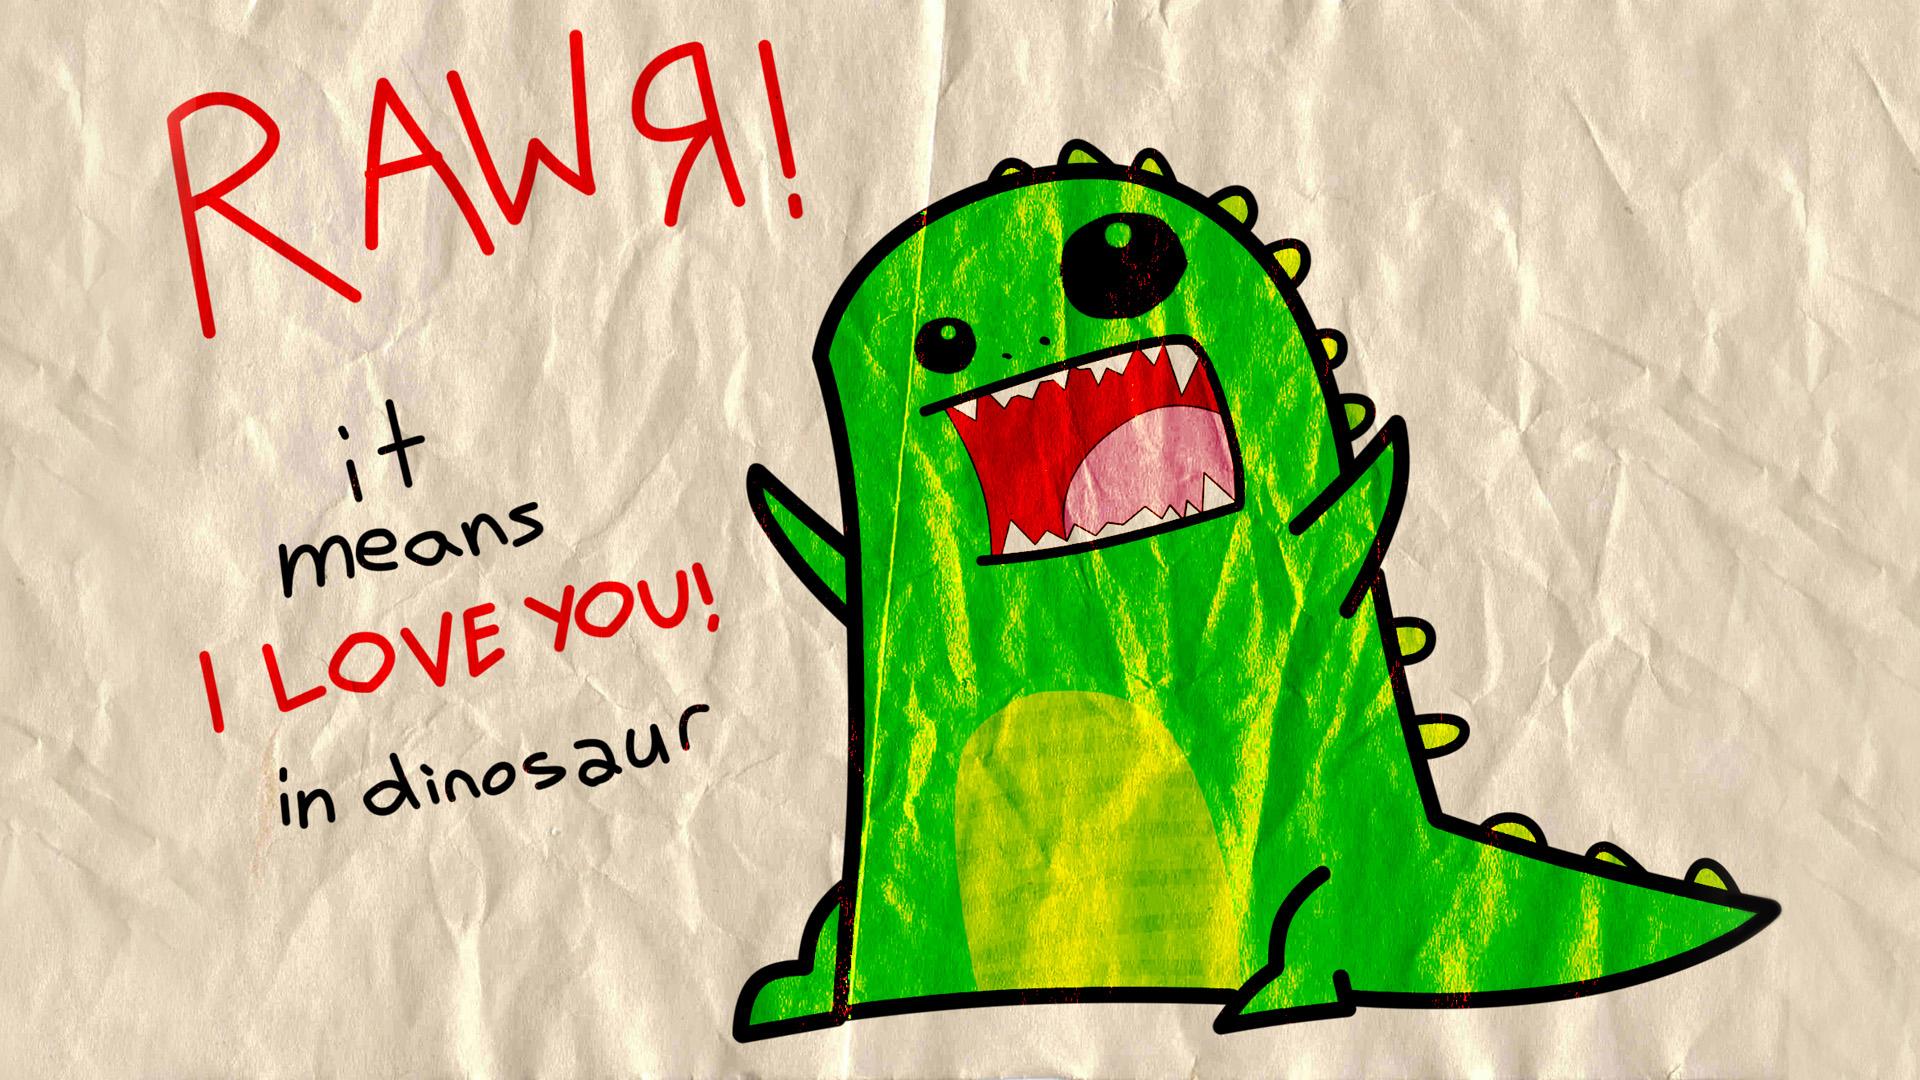 Dinosaur Wallpaper 2 Rawr Means I Love You In Dinosaur 1920x1080